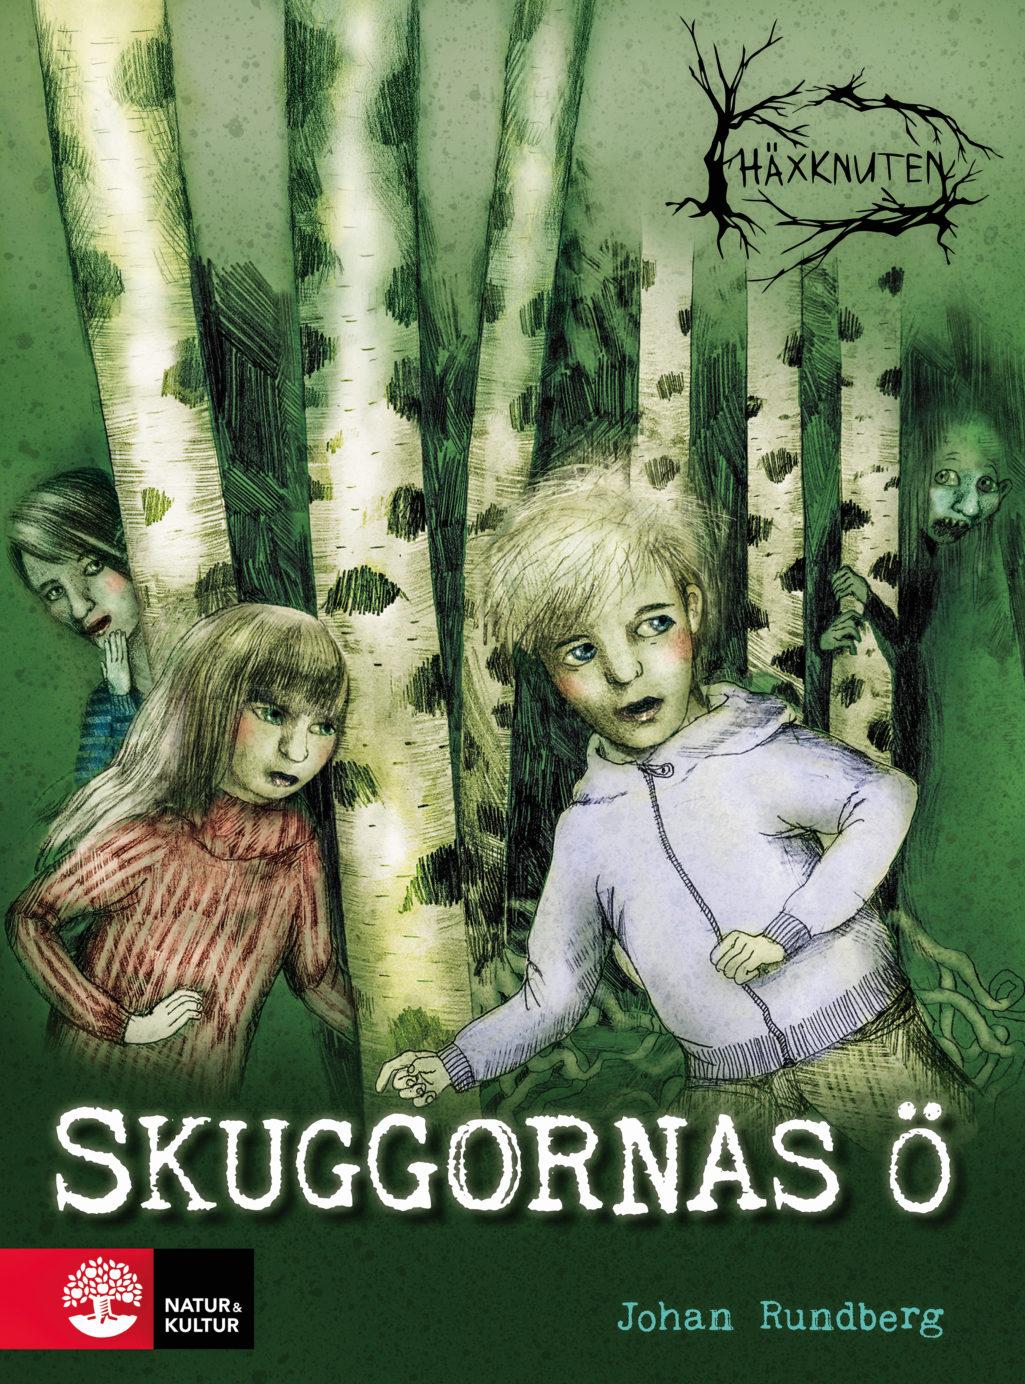 krundberg_skuggornas-o_u-rygg_0_